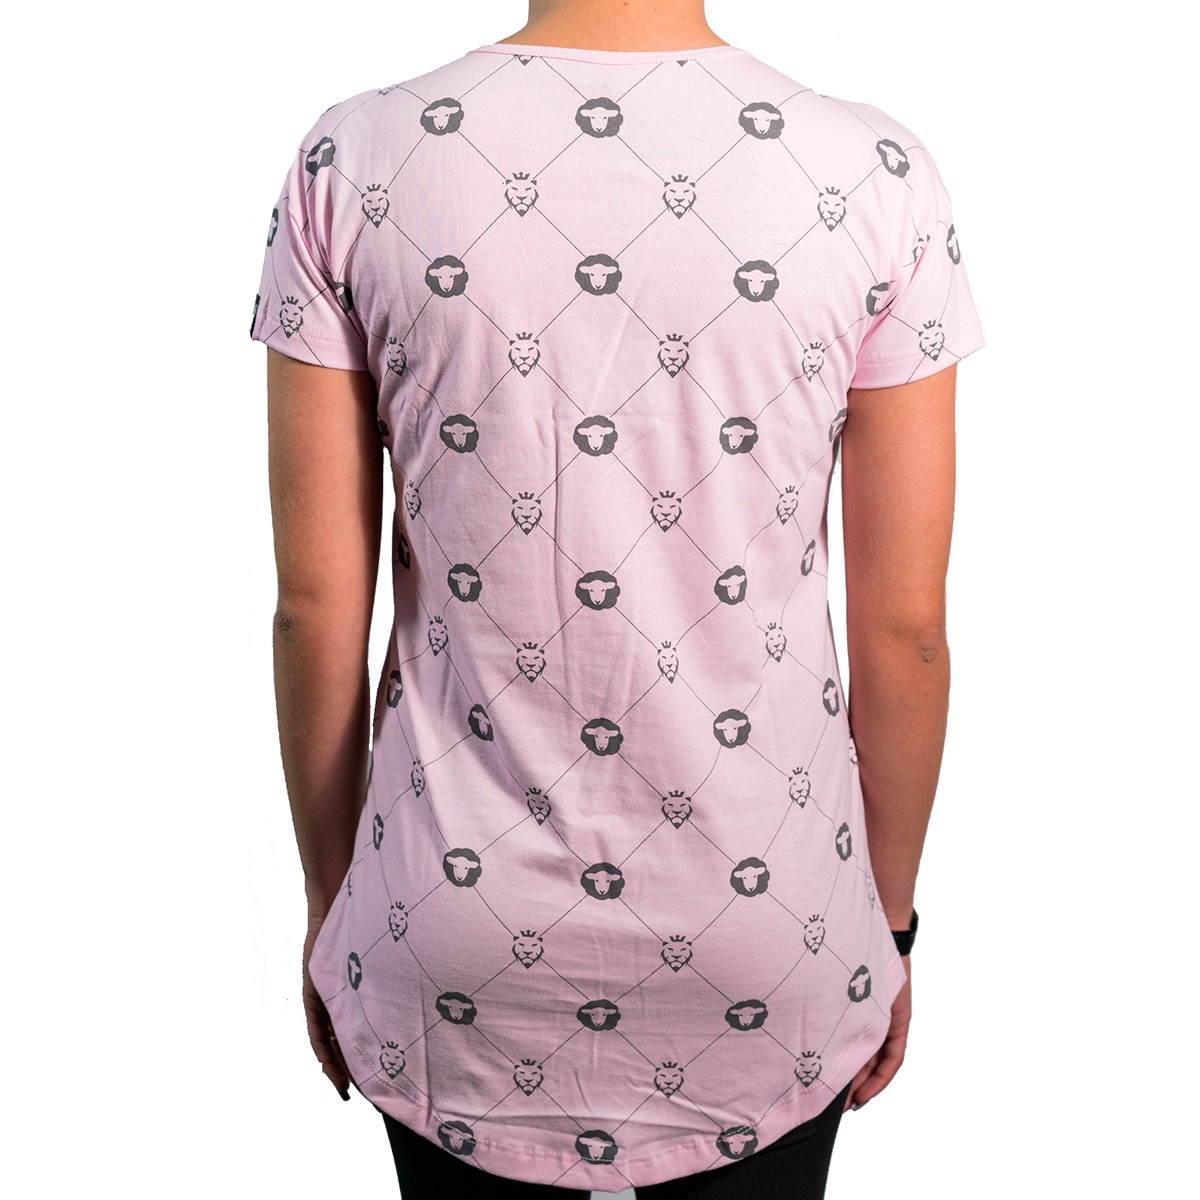 Camiseta Pattern Rosa Feminina - #REINODEPONTACABEÇA  - Jesuscopy